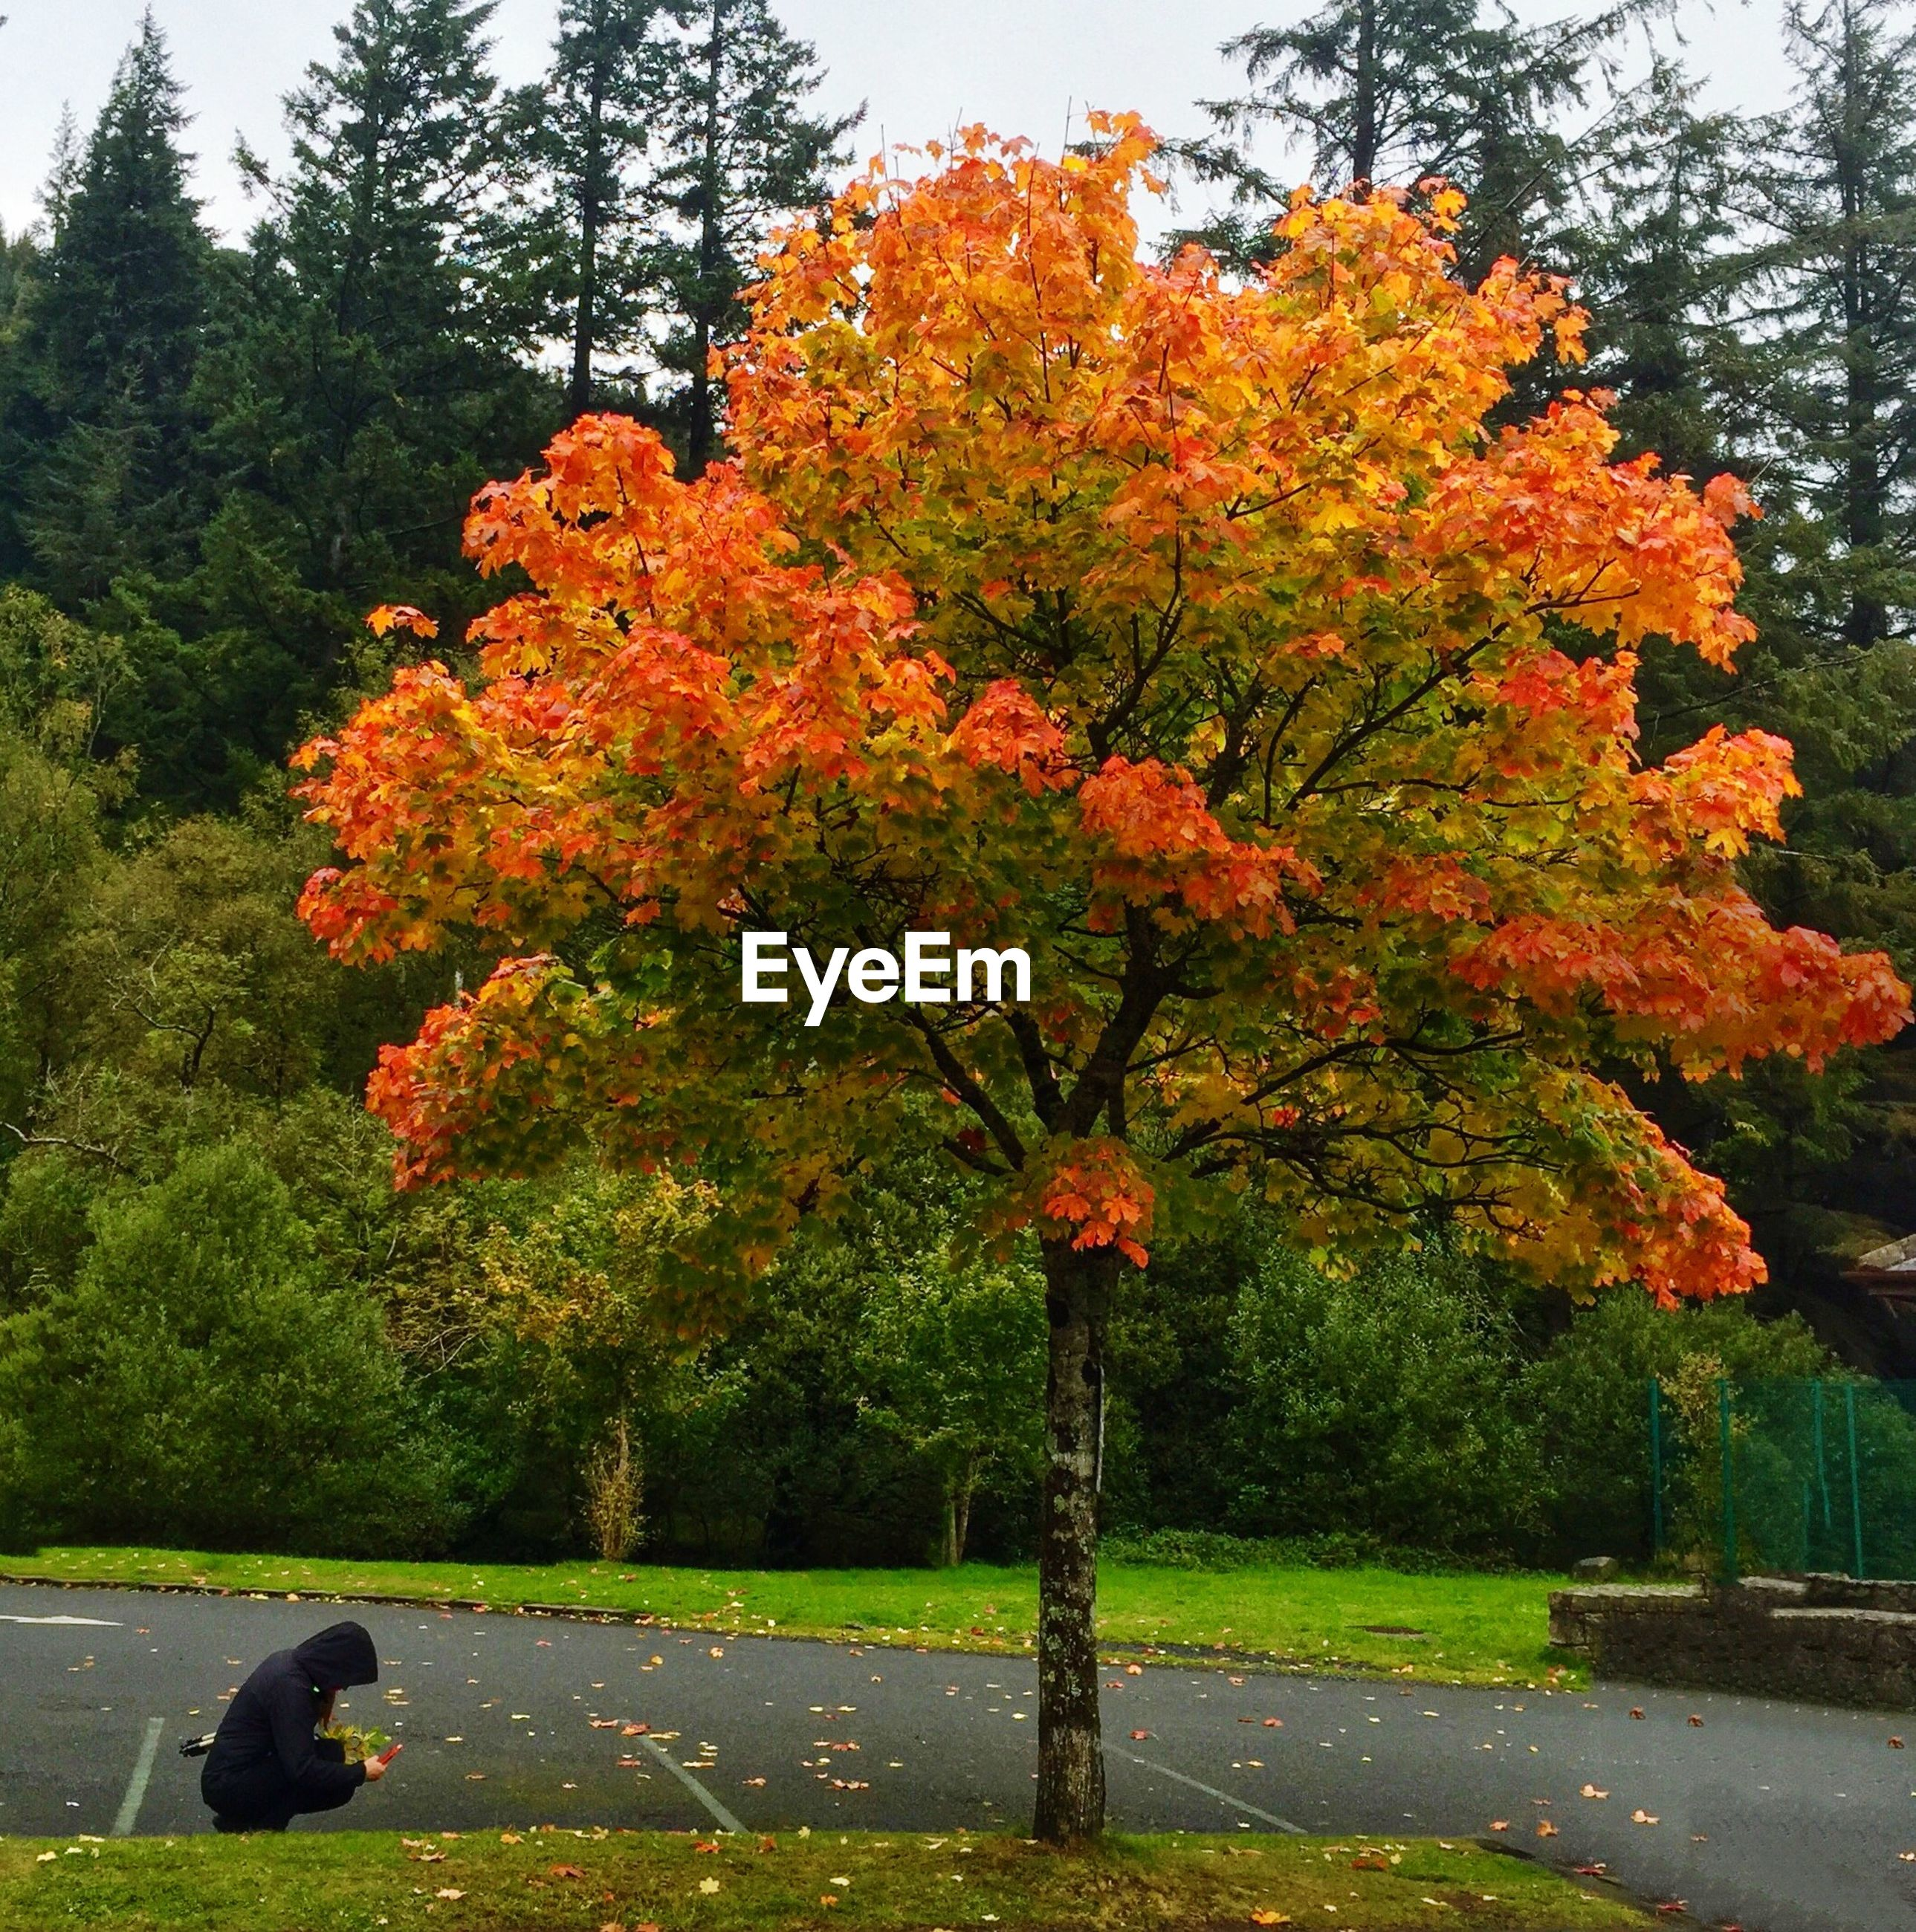 Autumn leaves on red tree